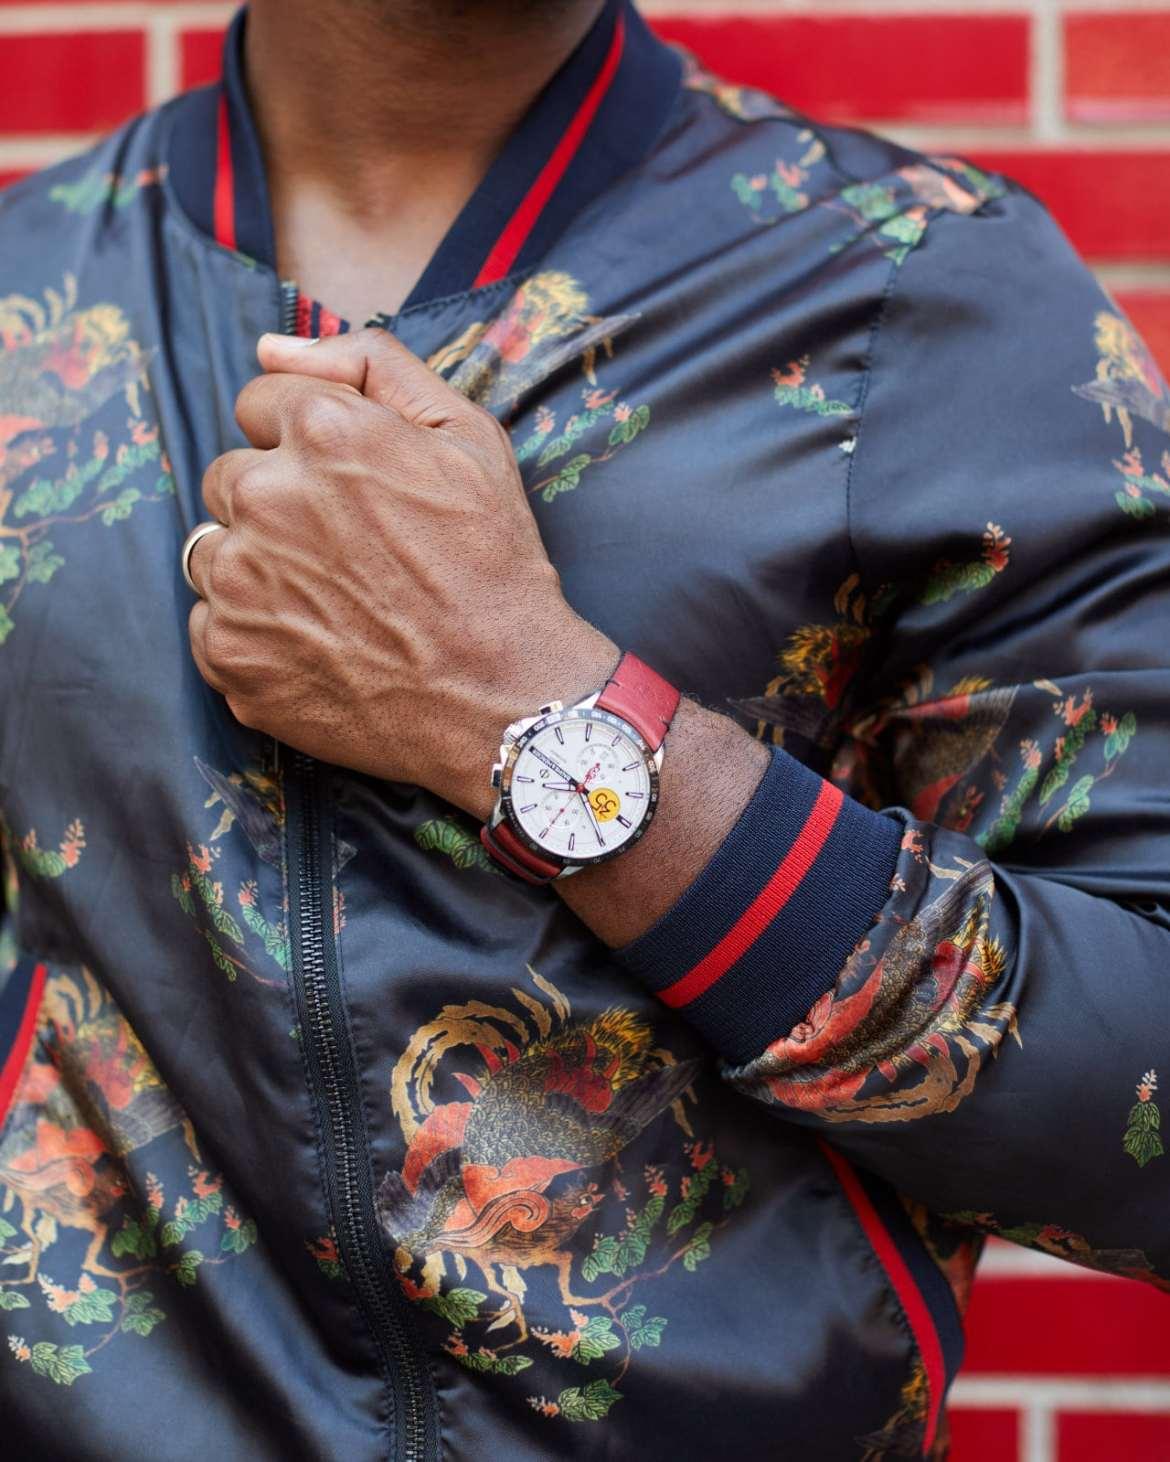 Baume et Mercier Clifton Club Indian Tribute Watch via Govberg Jewelers